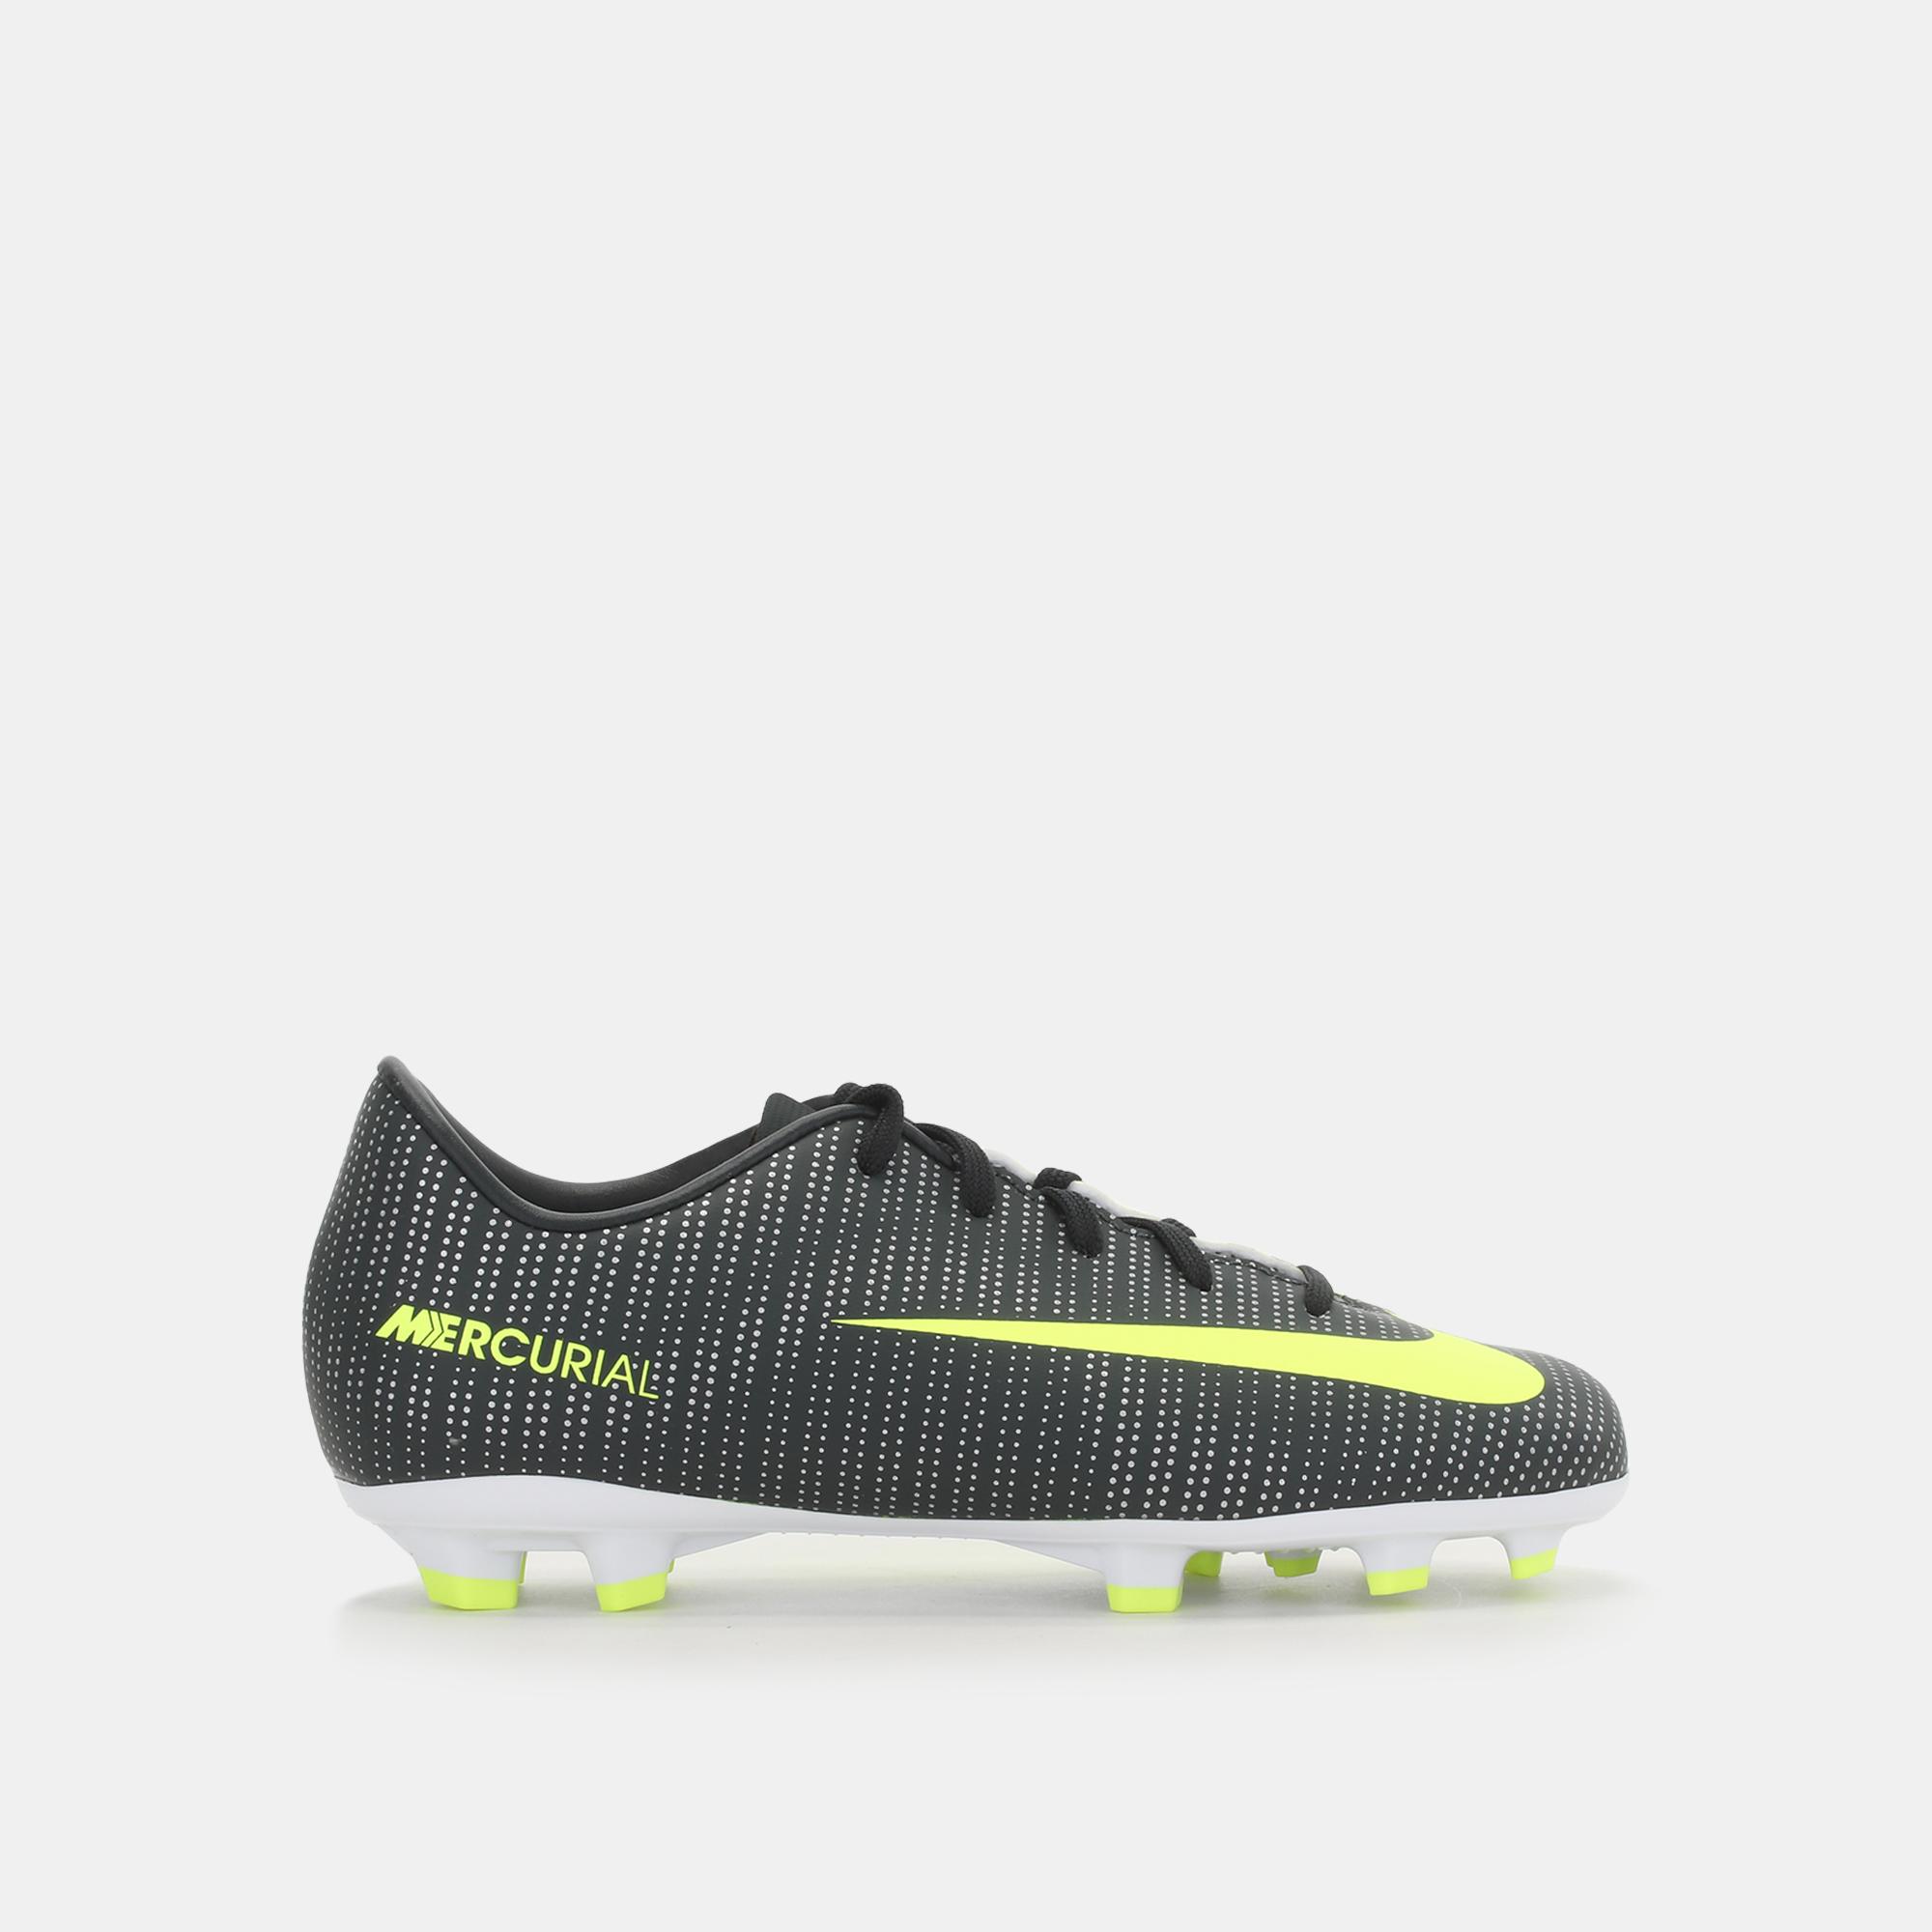 4feeac7fb6ac Nike Kids  Mercurial Vapor XI CR7 Firm Ground Football Shoe ...